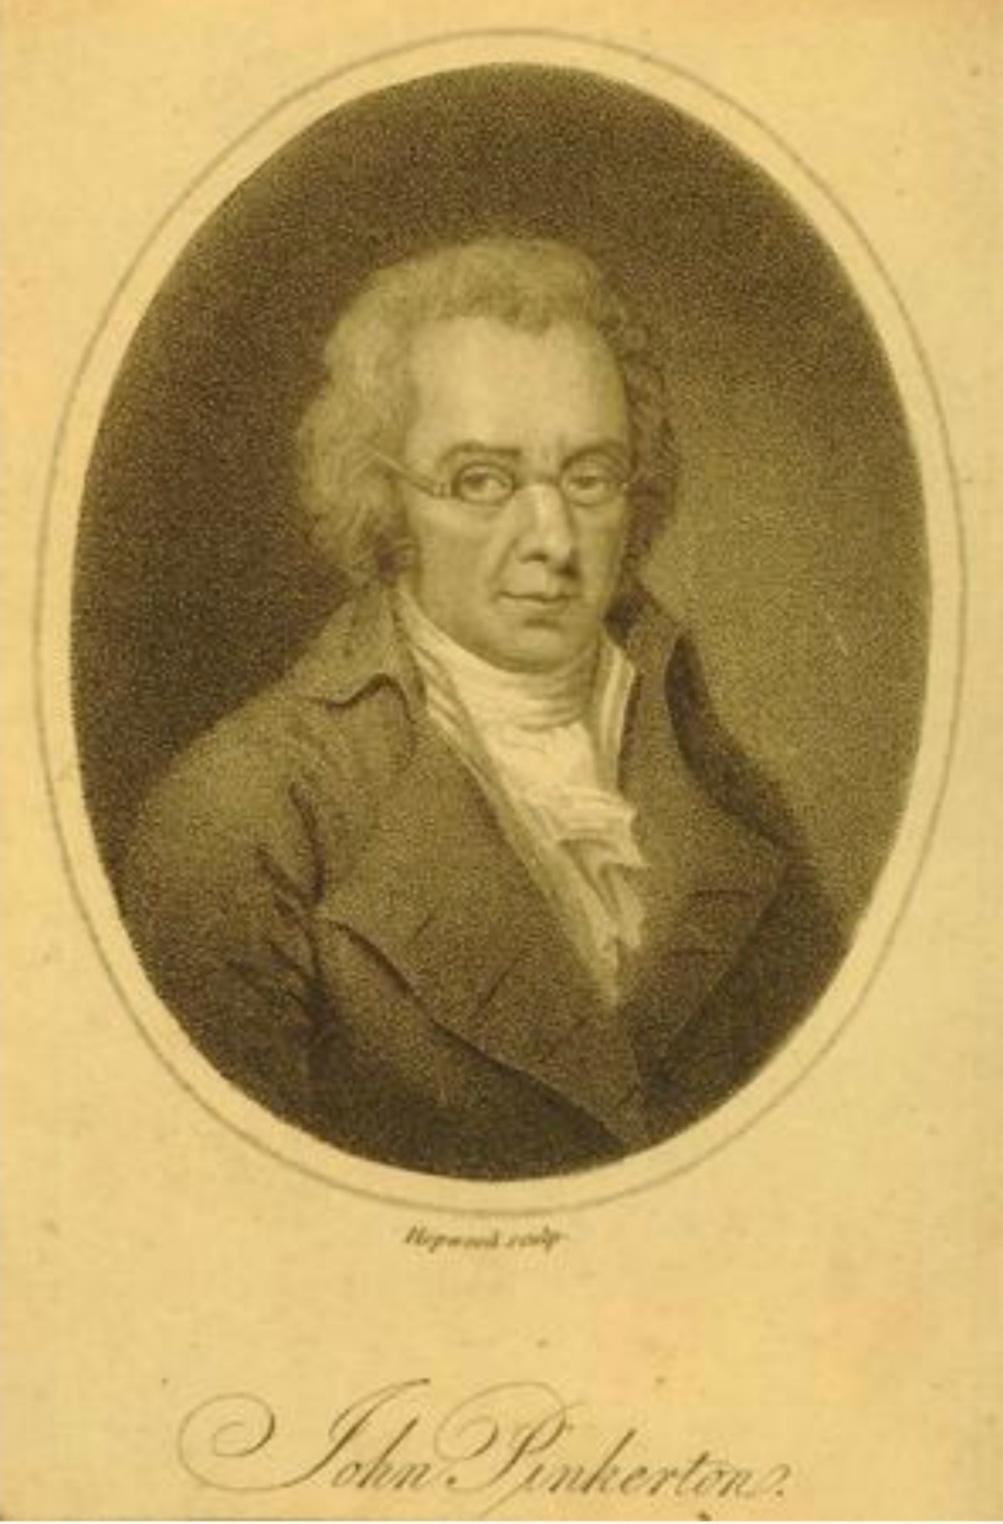 John Pikerton